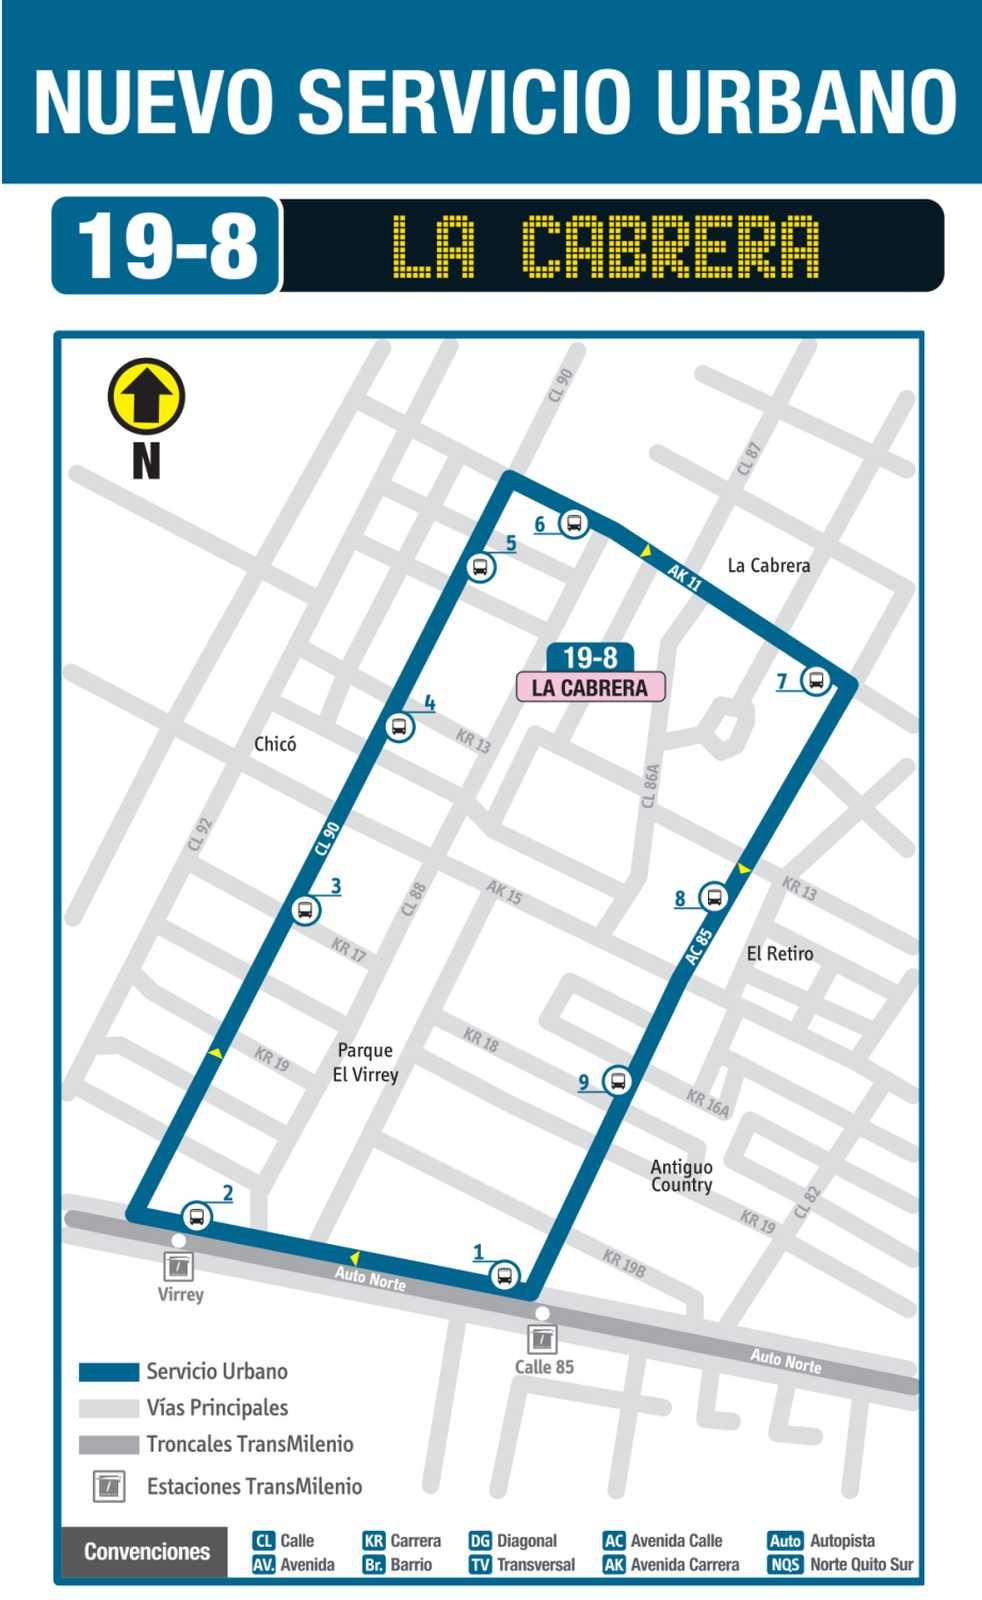 Ruta SITP: 19-8 La Cabrera (recorrido)